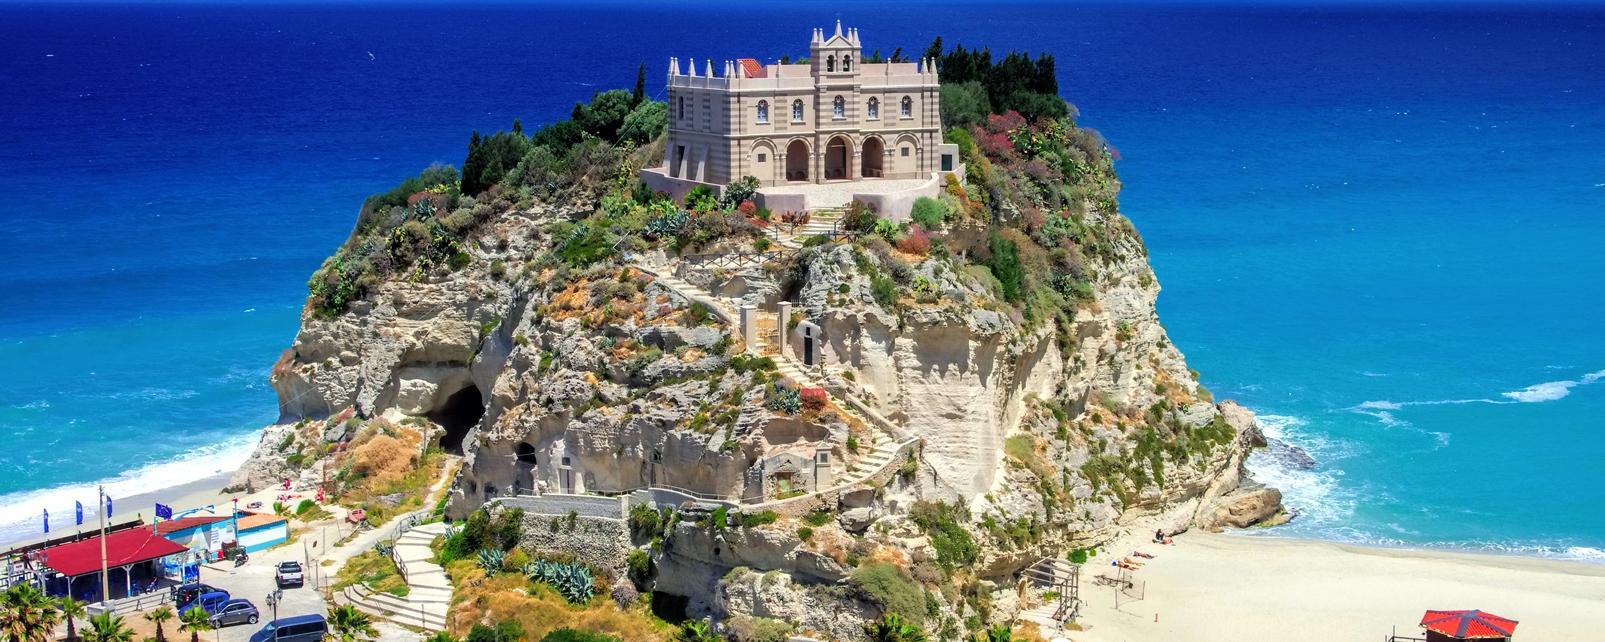 Europe, Italie, Calabre, Tropea, église, plage, mer, religion, arbre,